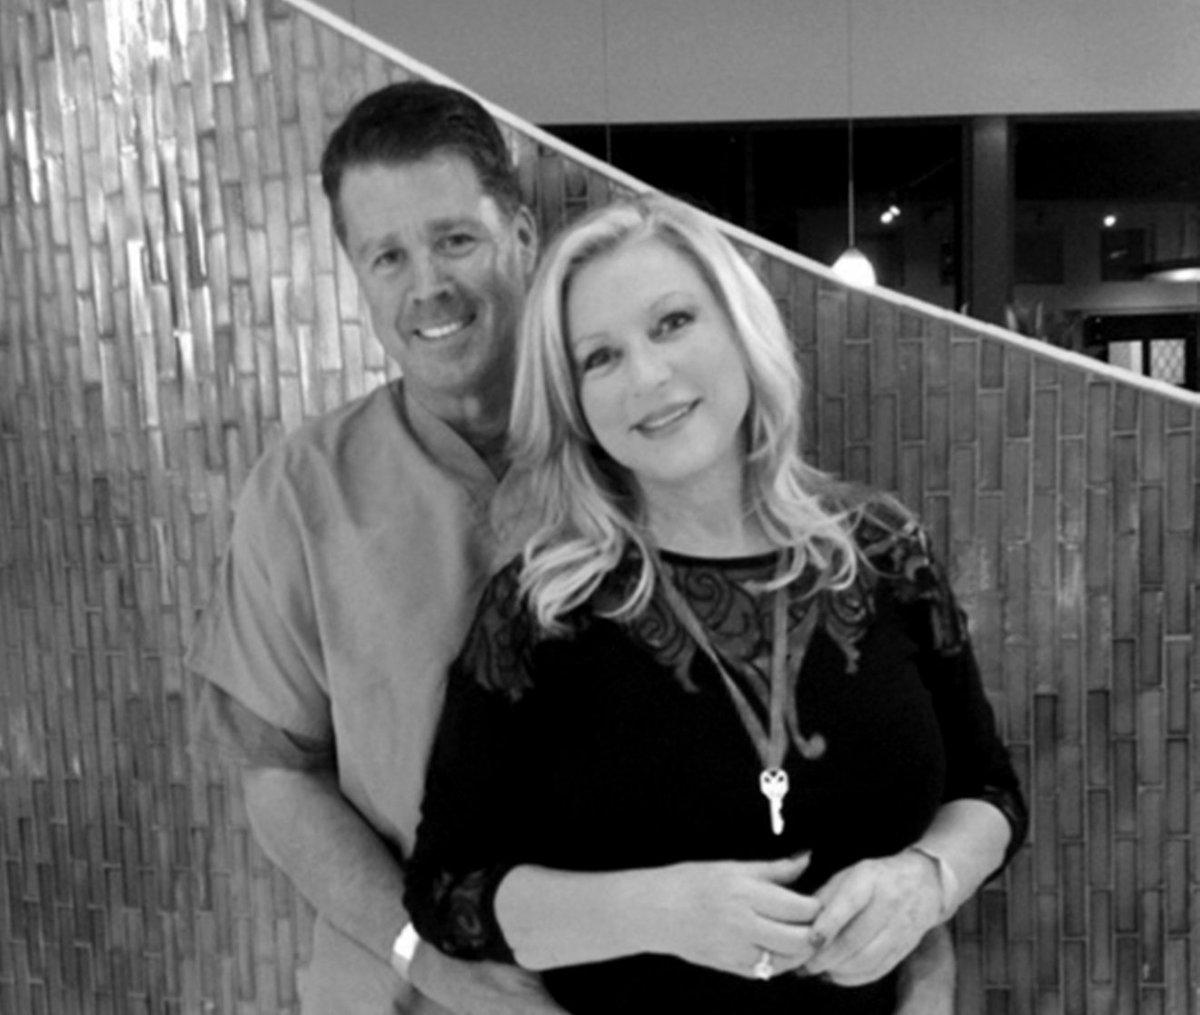 Debra and John